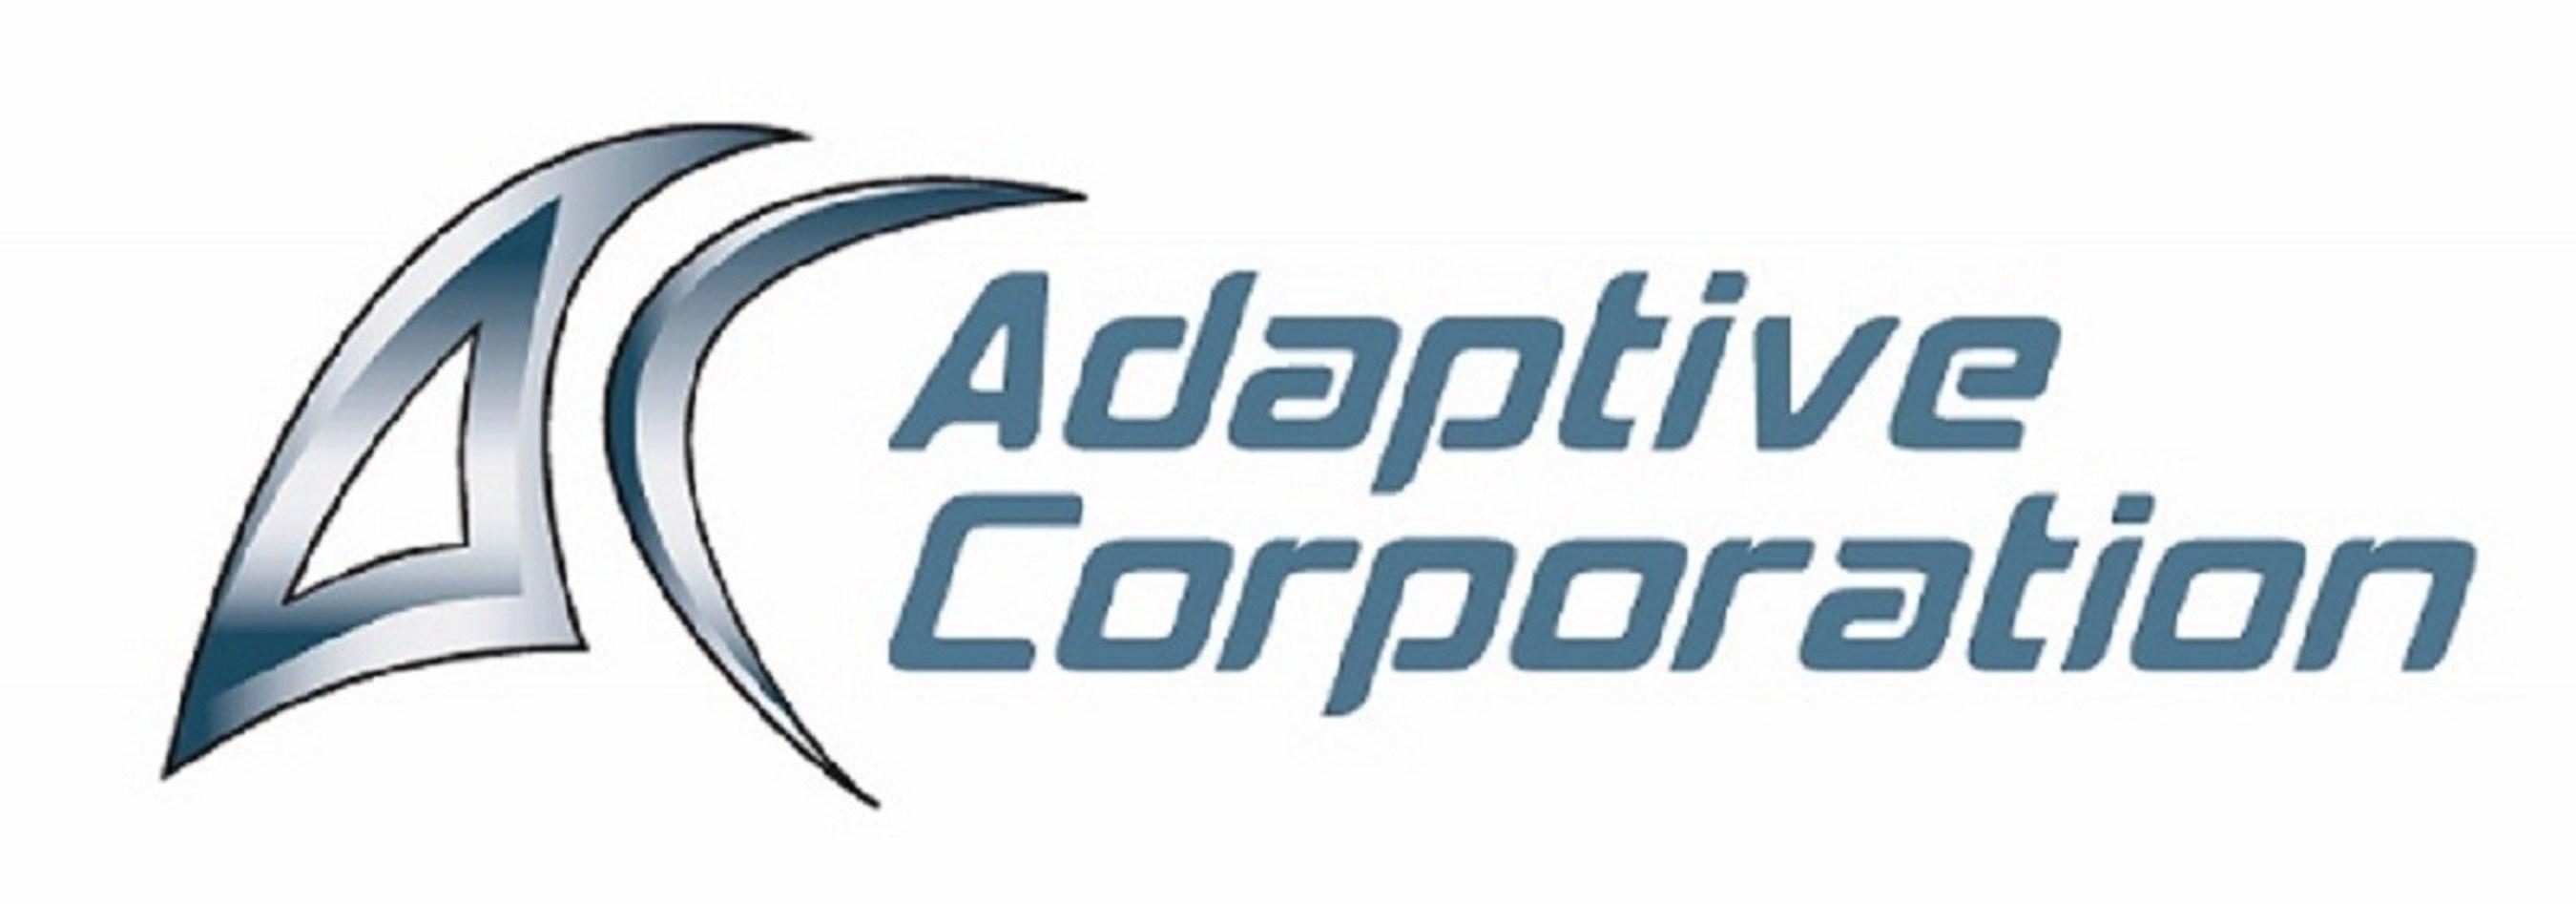 Adaptive Corporation logo